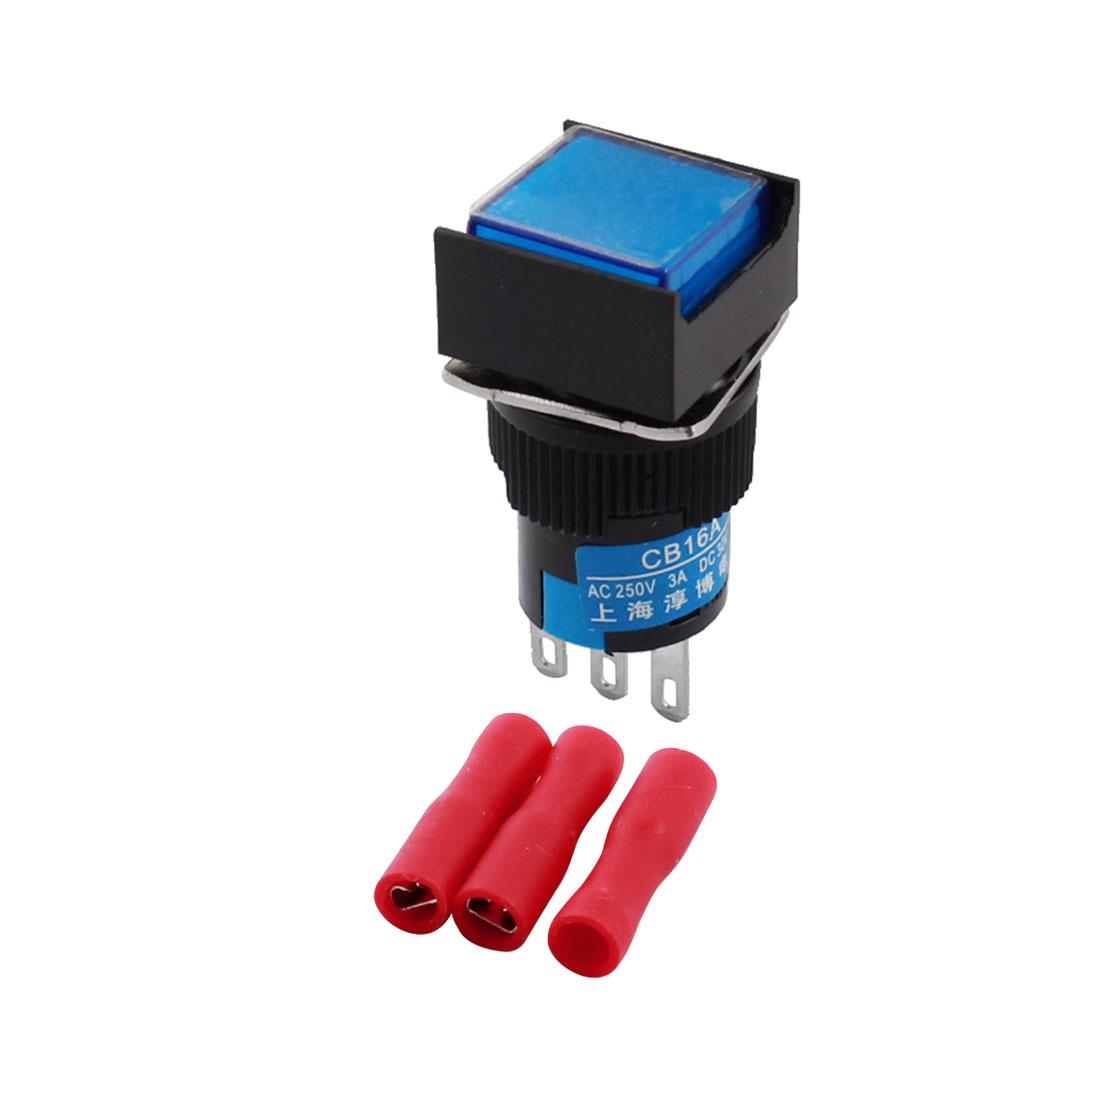 AC 250V 3A DC 30V 5A Blue Button 16mm Thread 3Pins Panel Mount SPDT Locking Square Head Pushbutton Switch + 3pcs Crimp Connectors